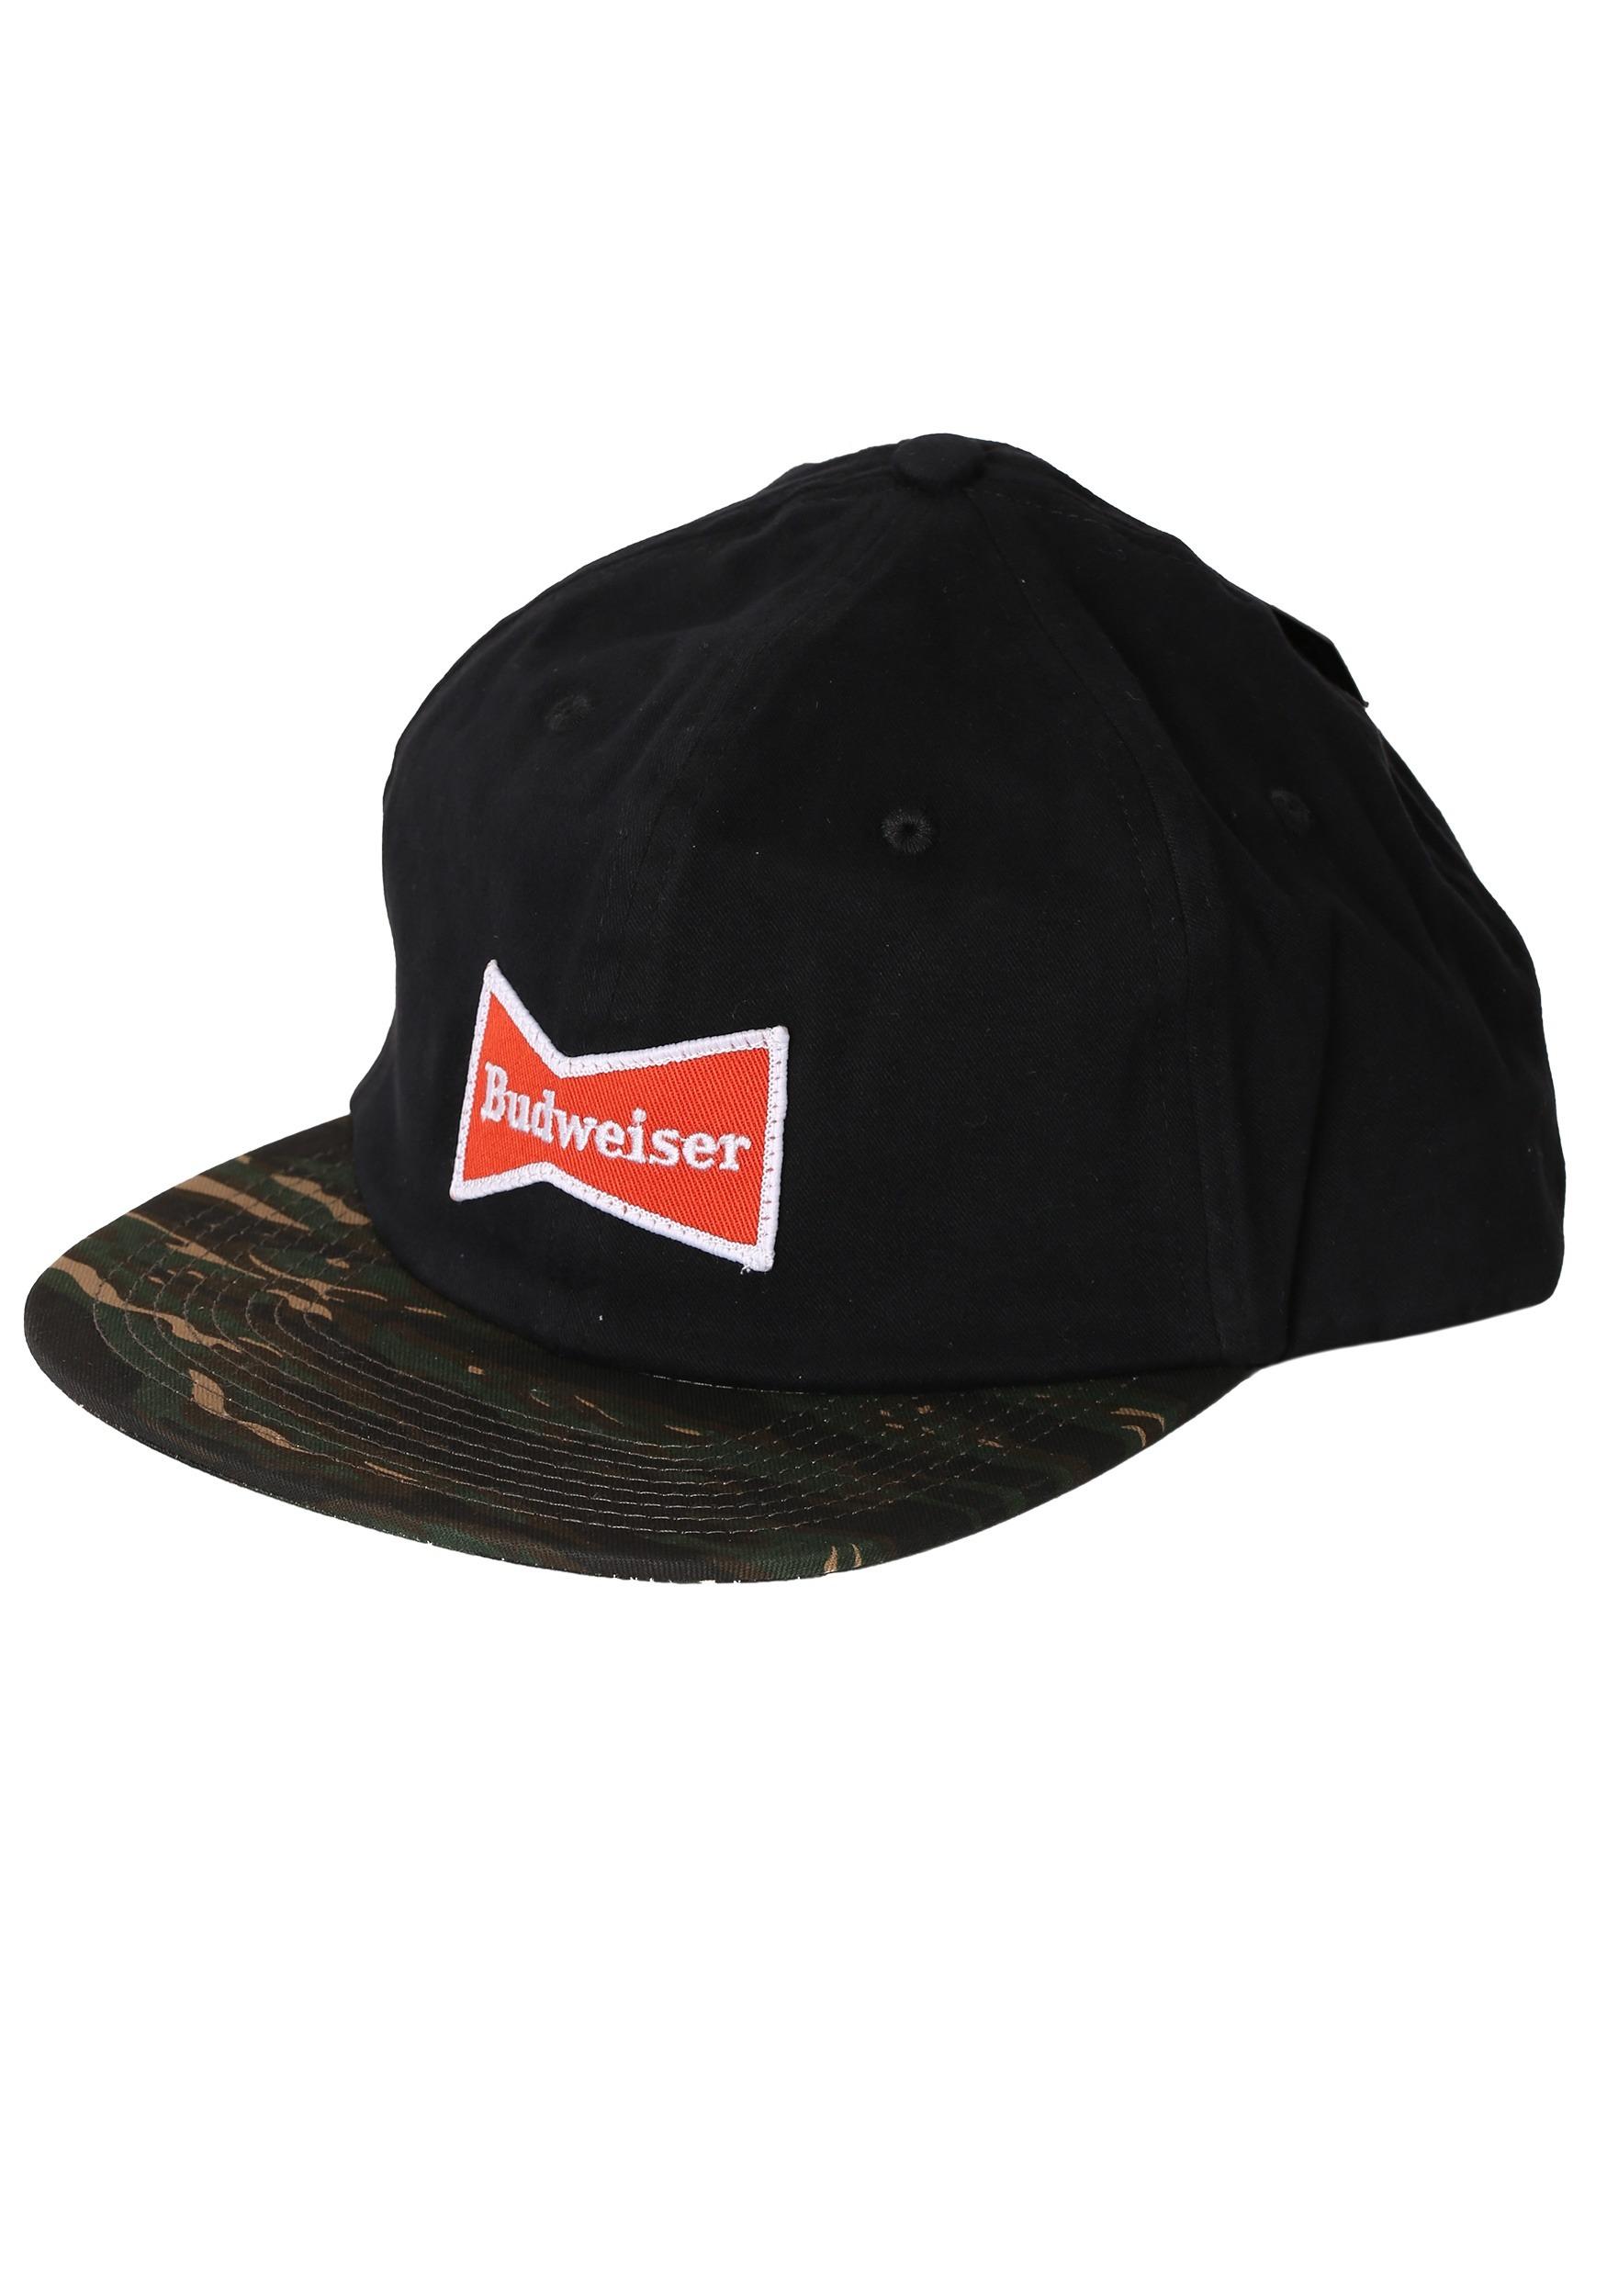 cfb09740863e3 Bowtie Black Camo Budweiser Flatbill Hat